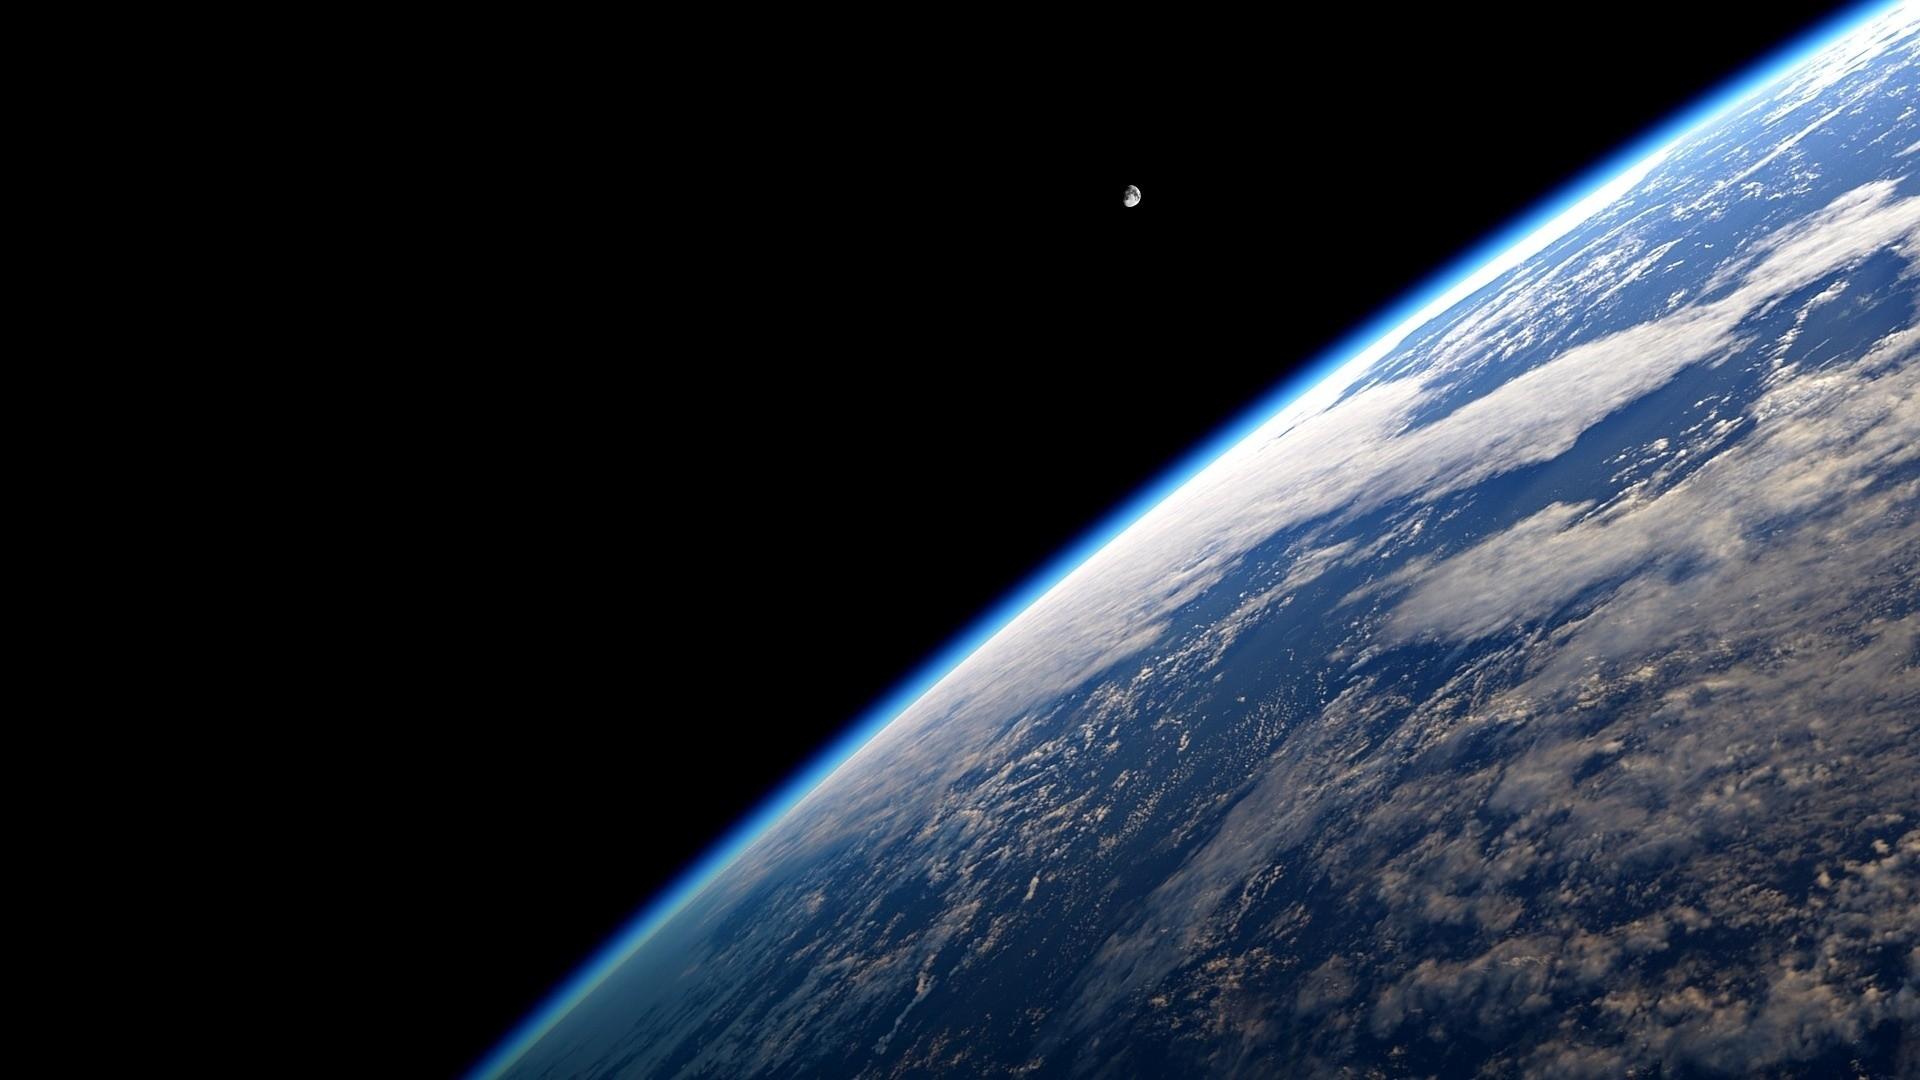 Earth Space Background | wallpaper, wallpaper hd, background desktop